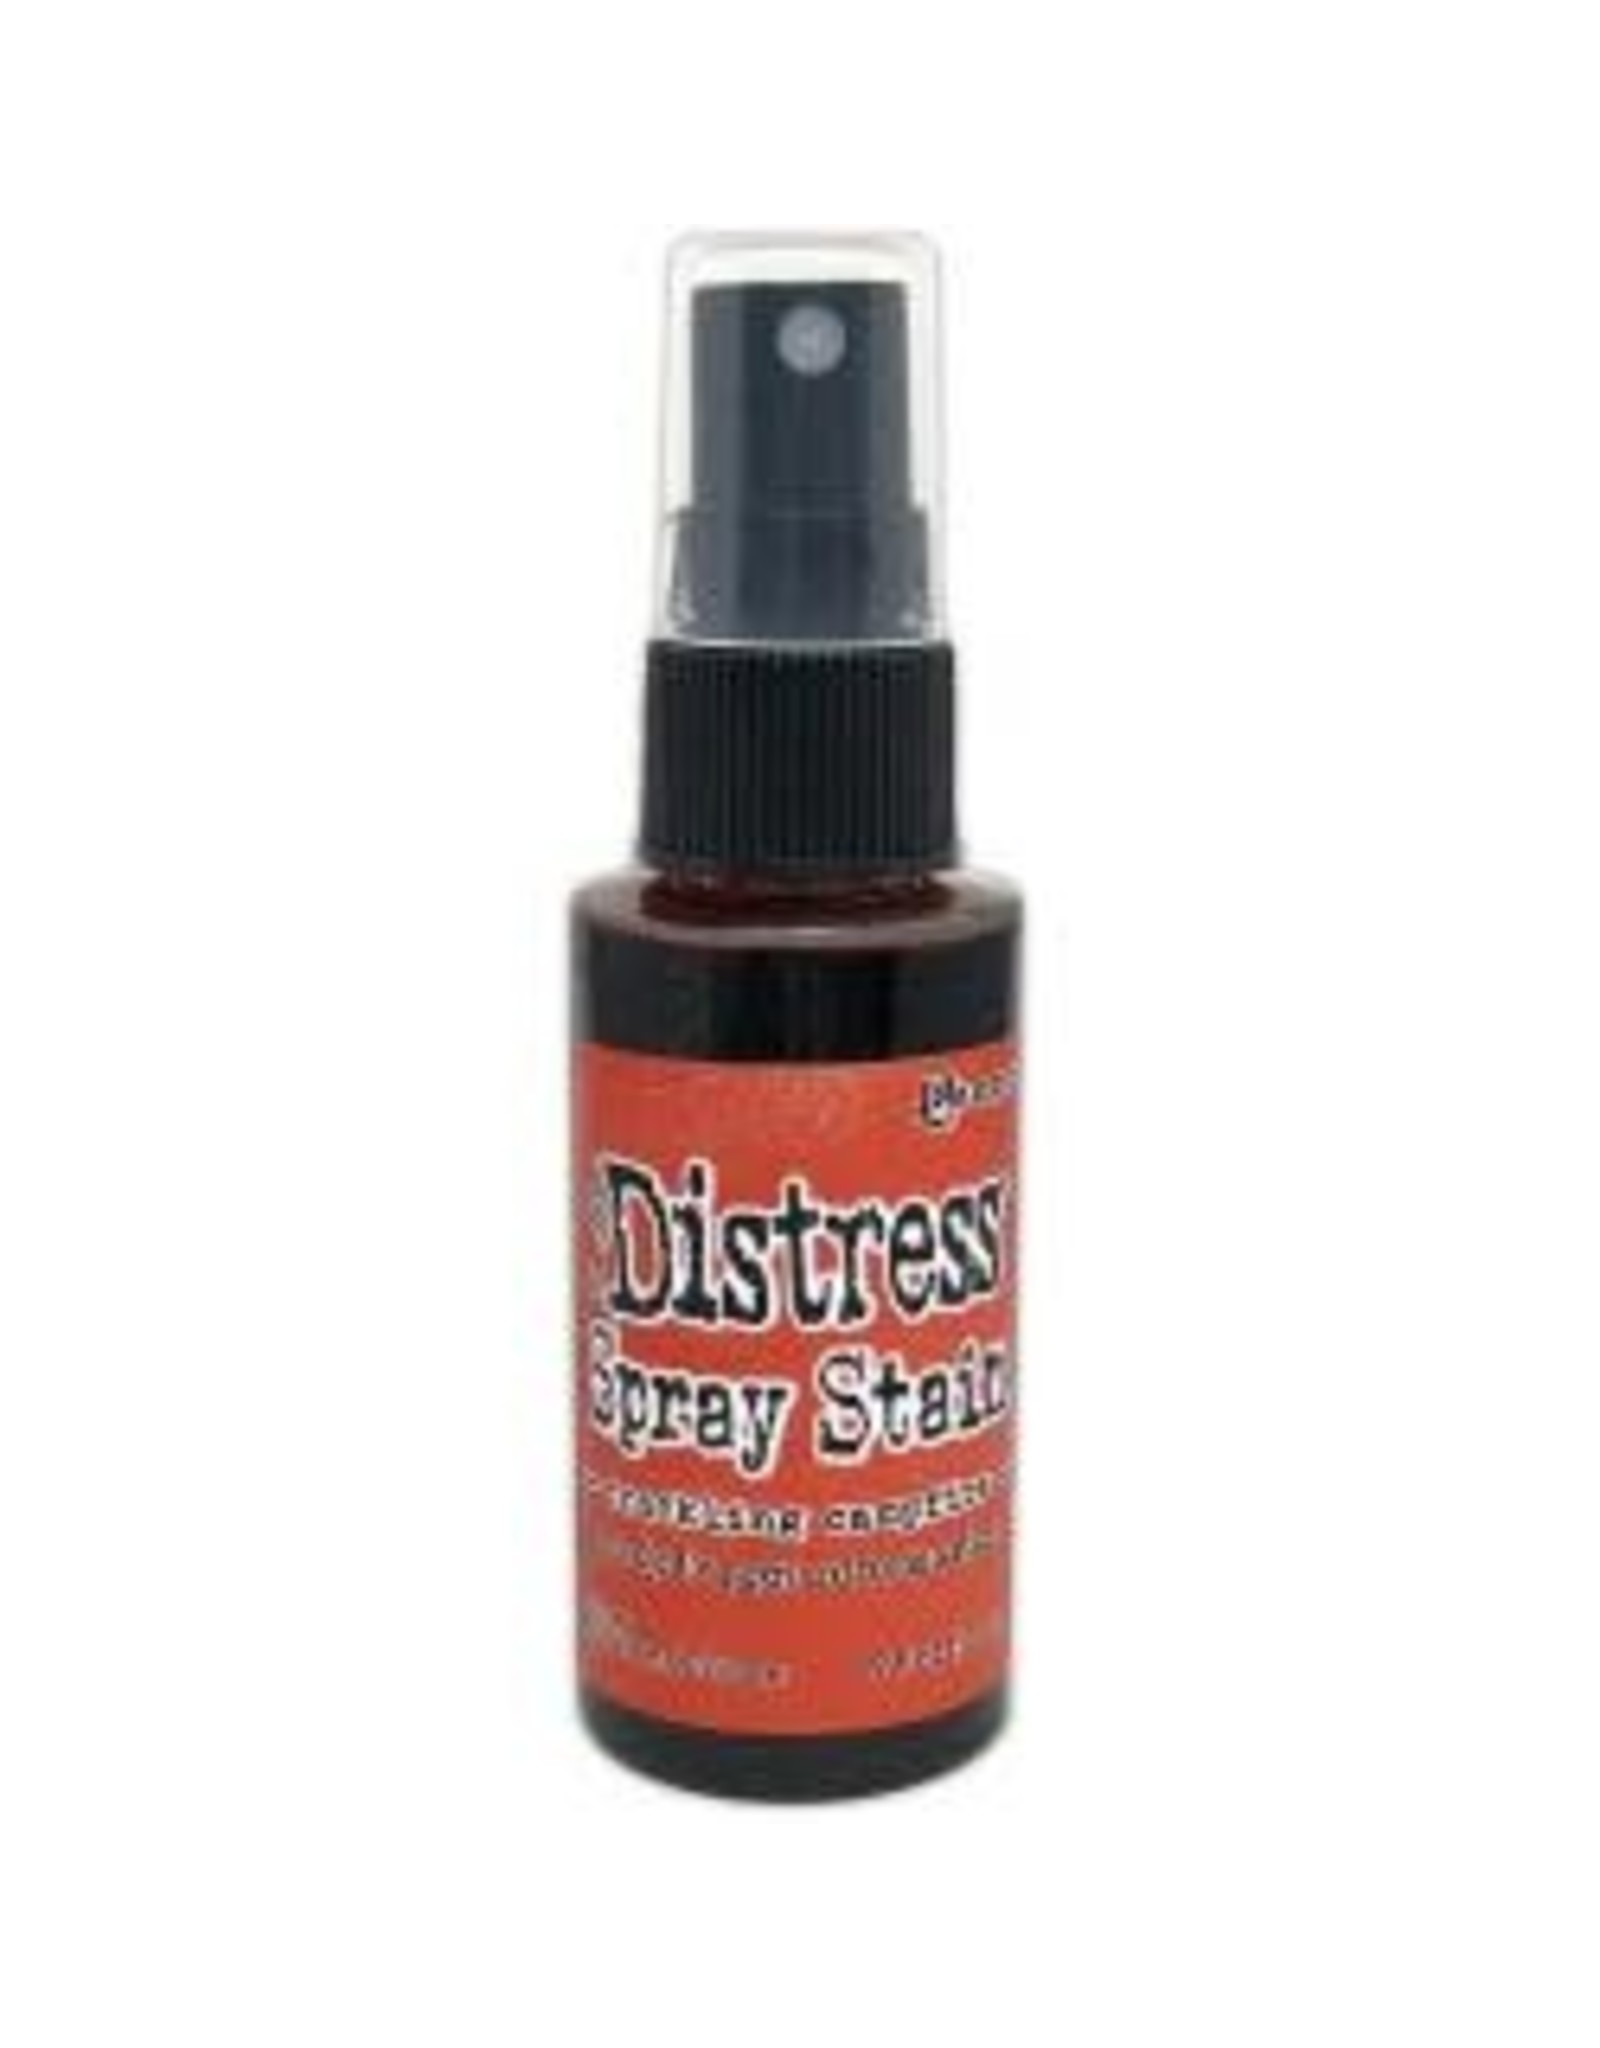 Ranger Distress Spray Stain - Crackling Campfire